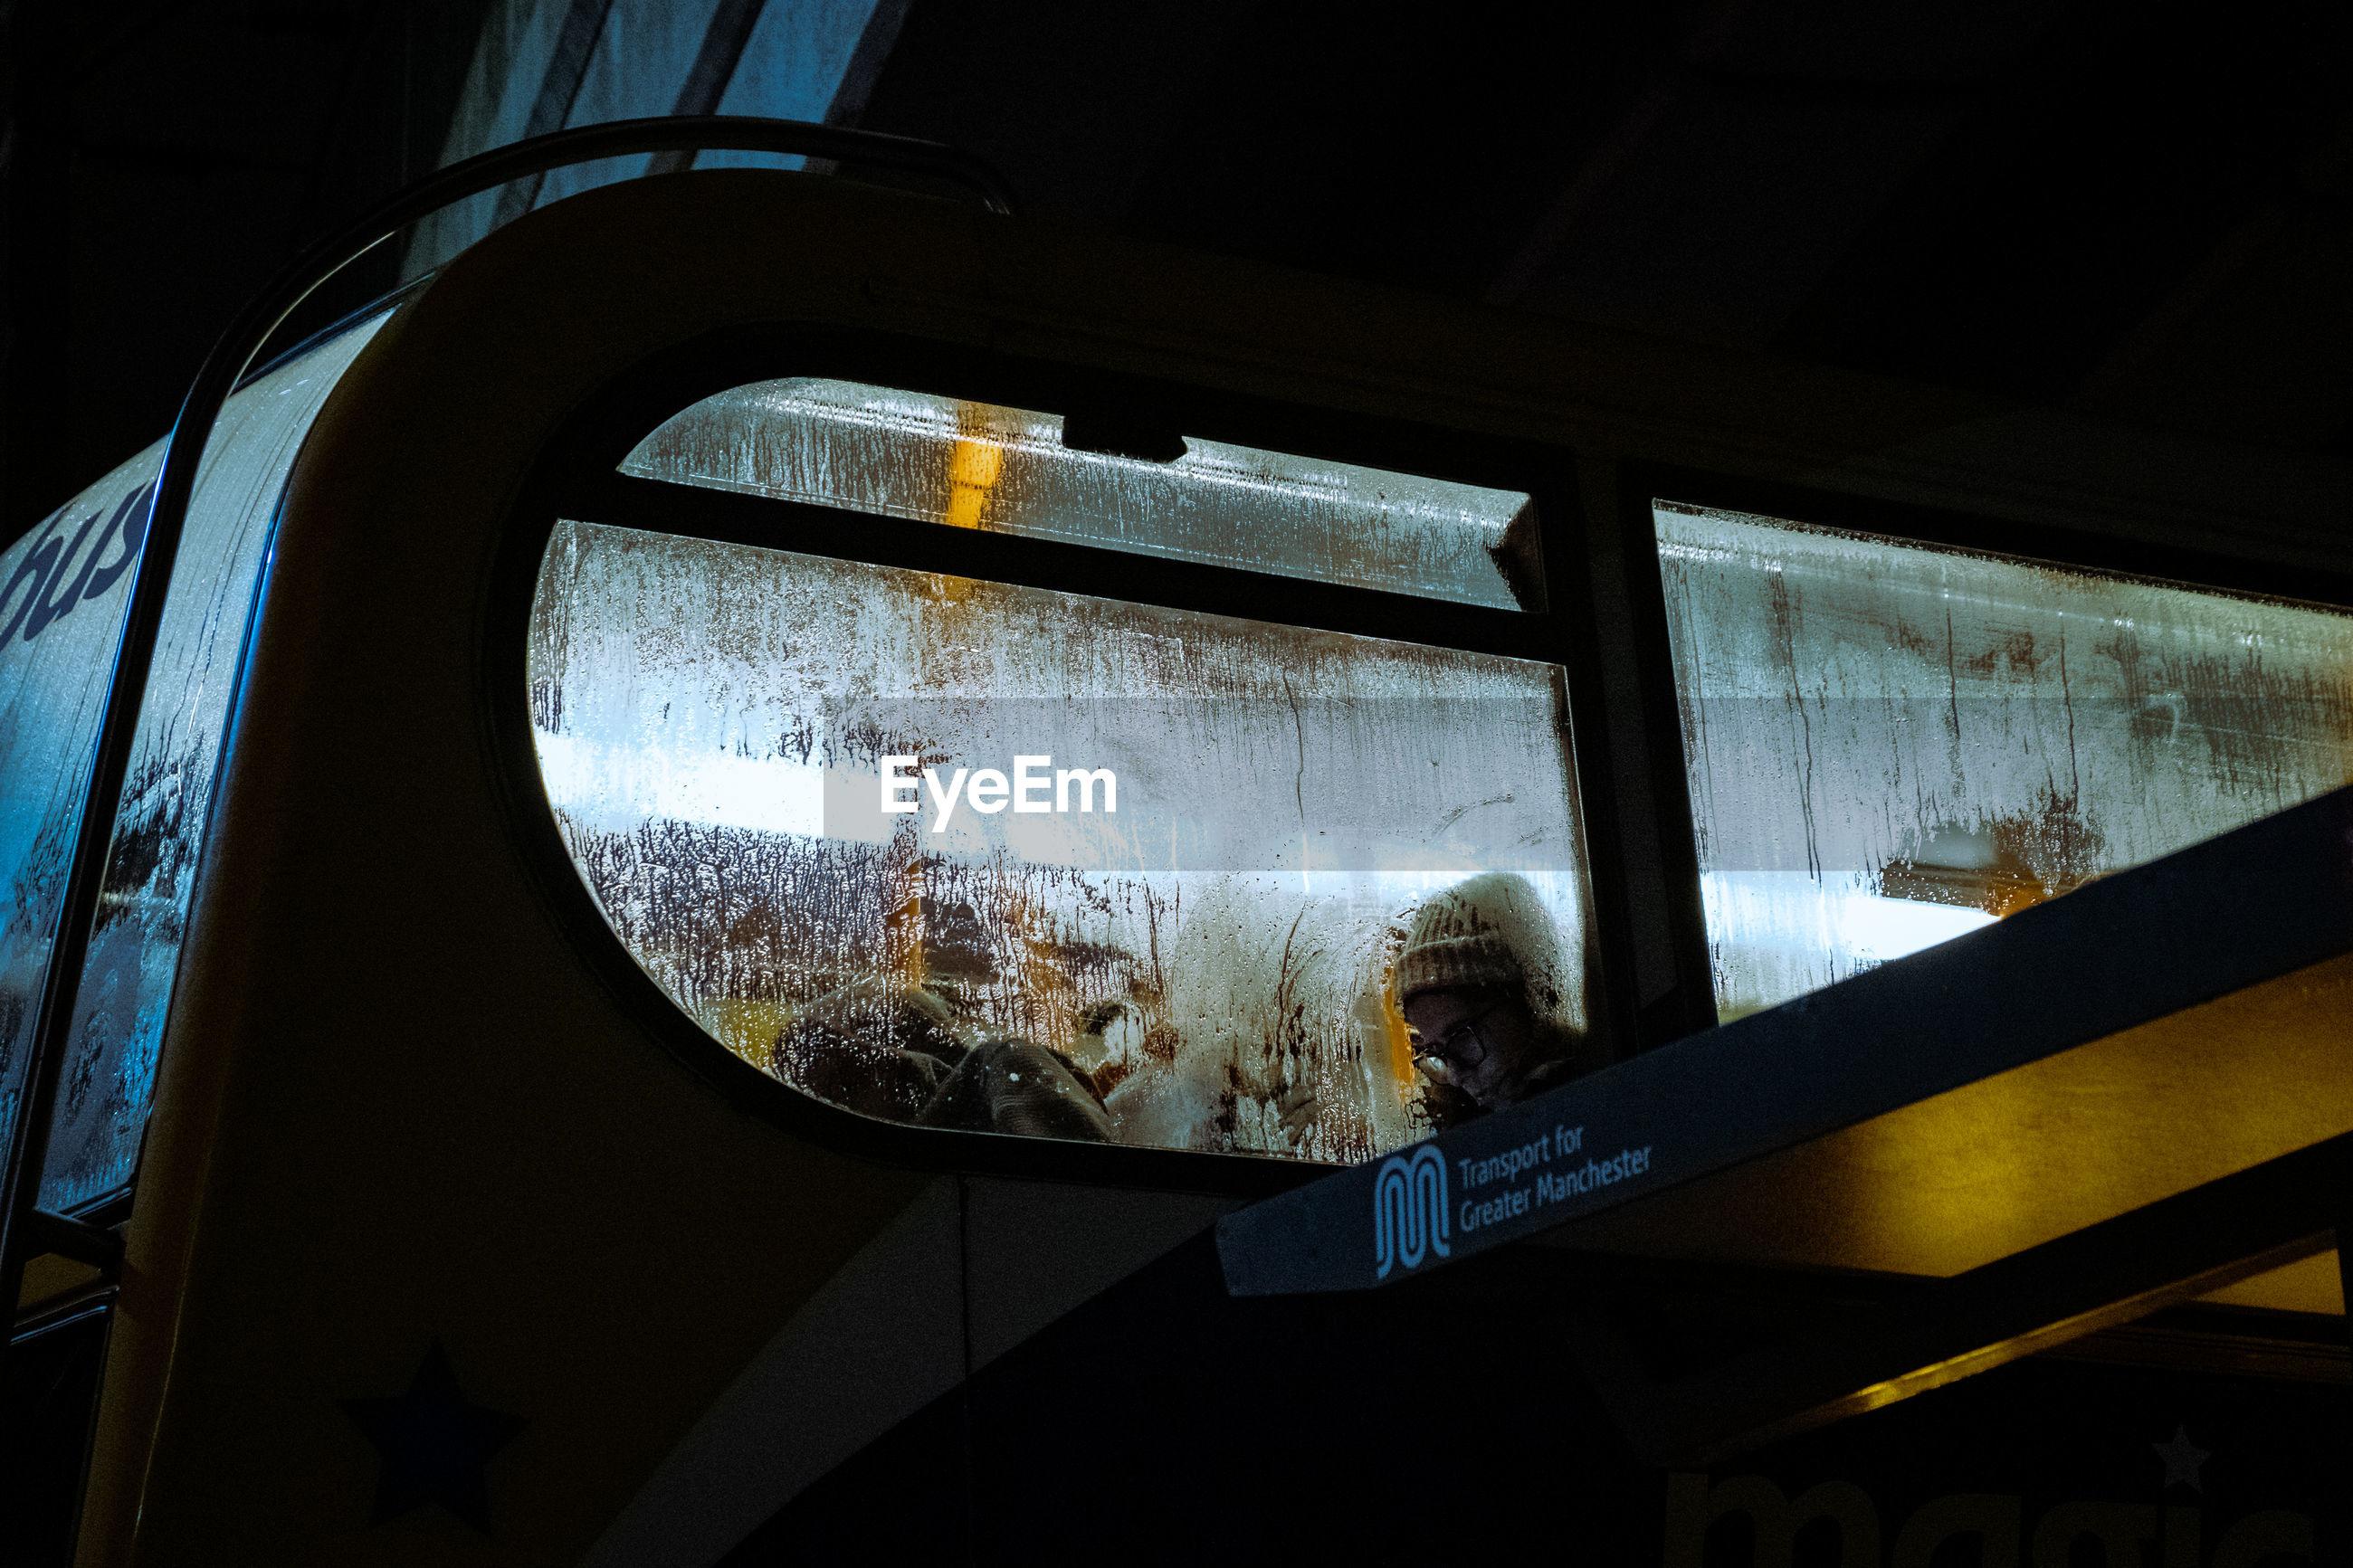 REFLECTION OF TRAIN WINDOW IN RAILROAD STATION